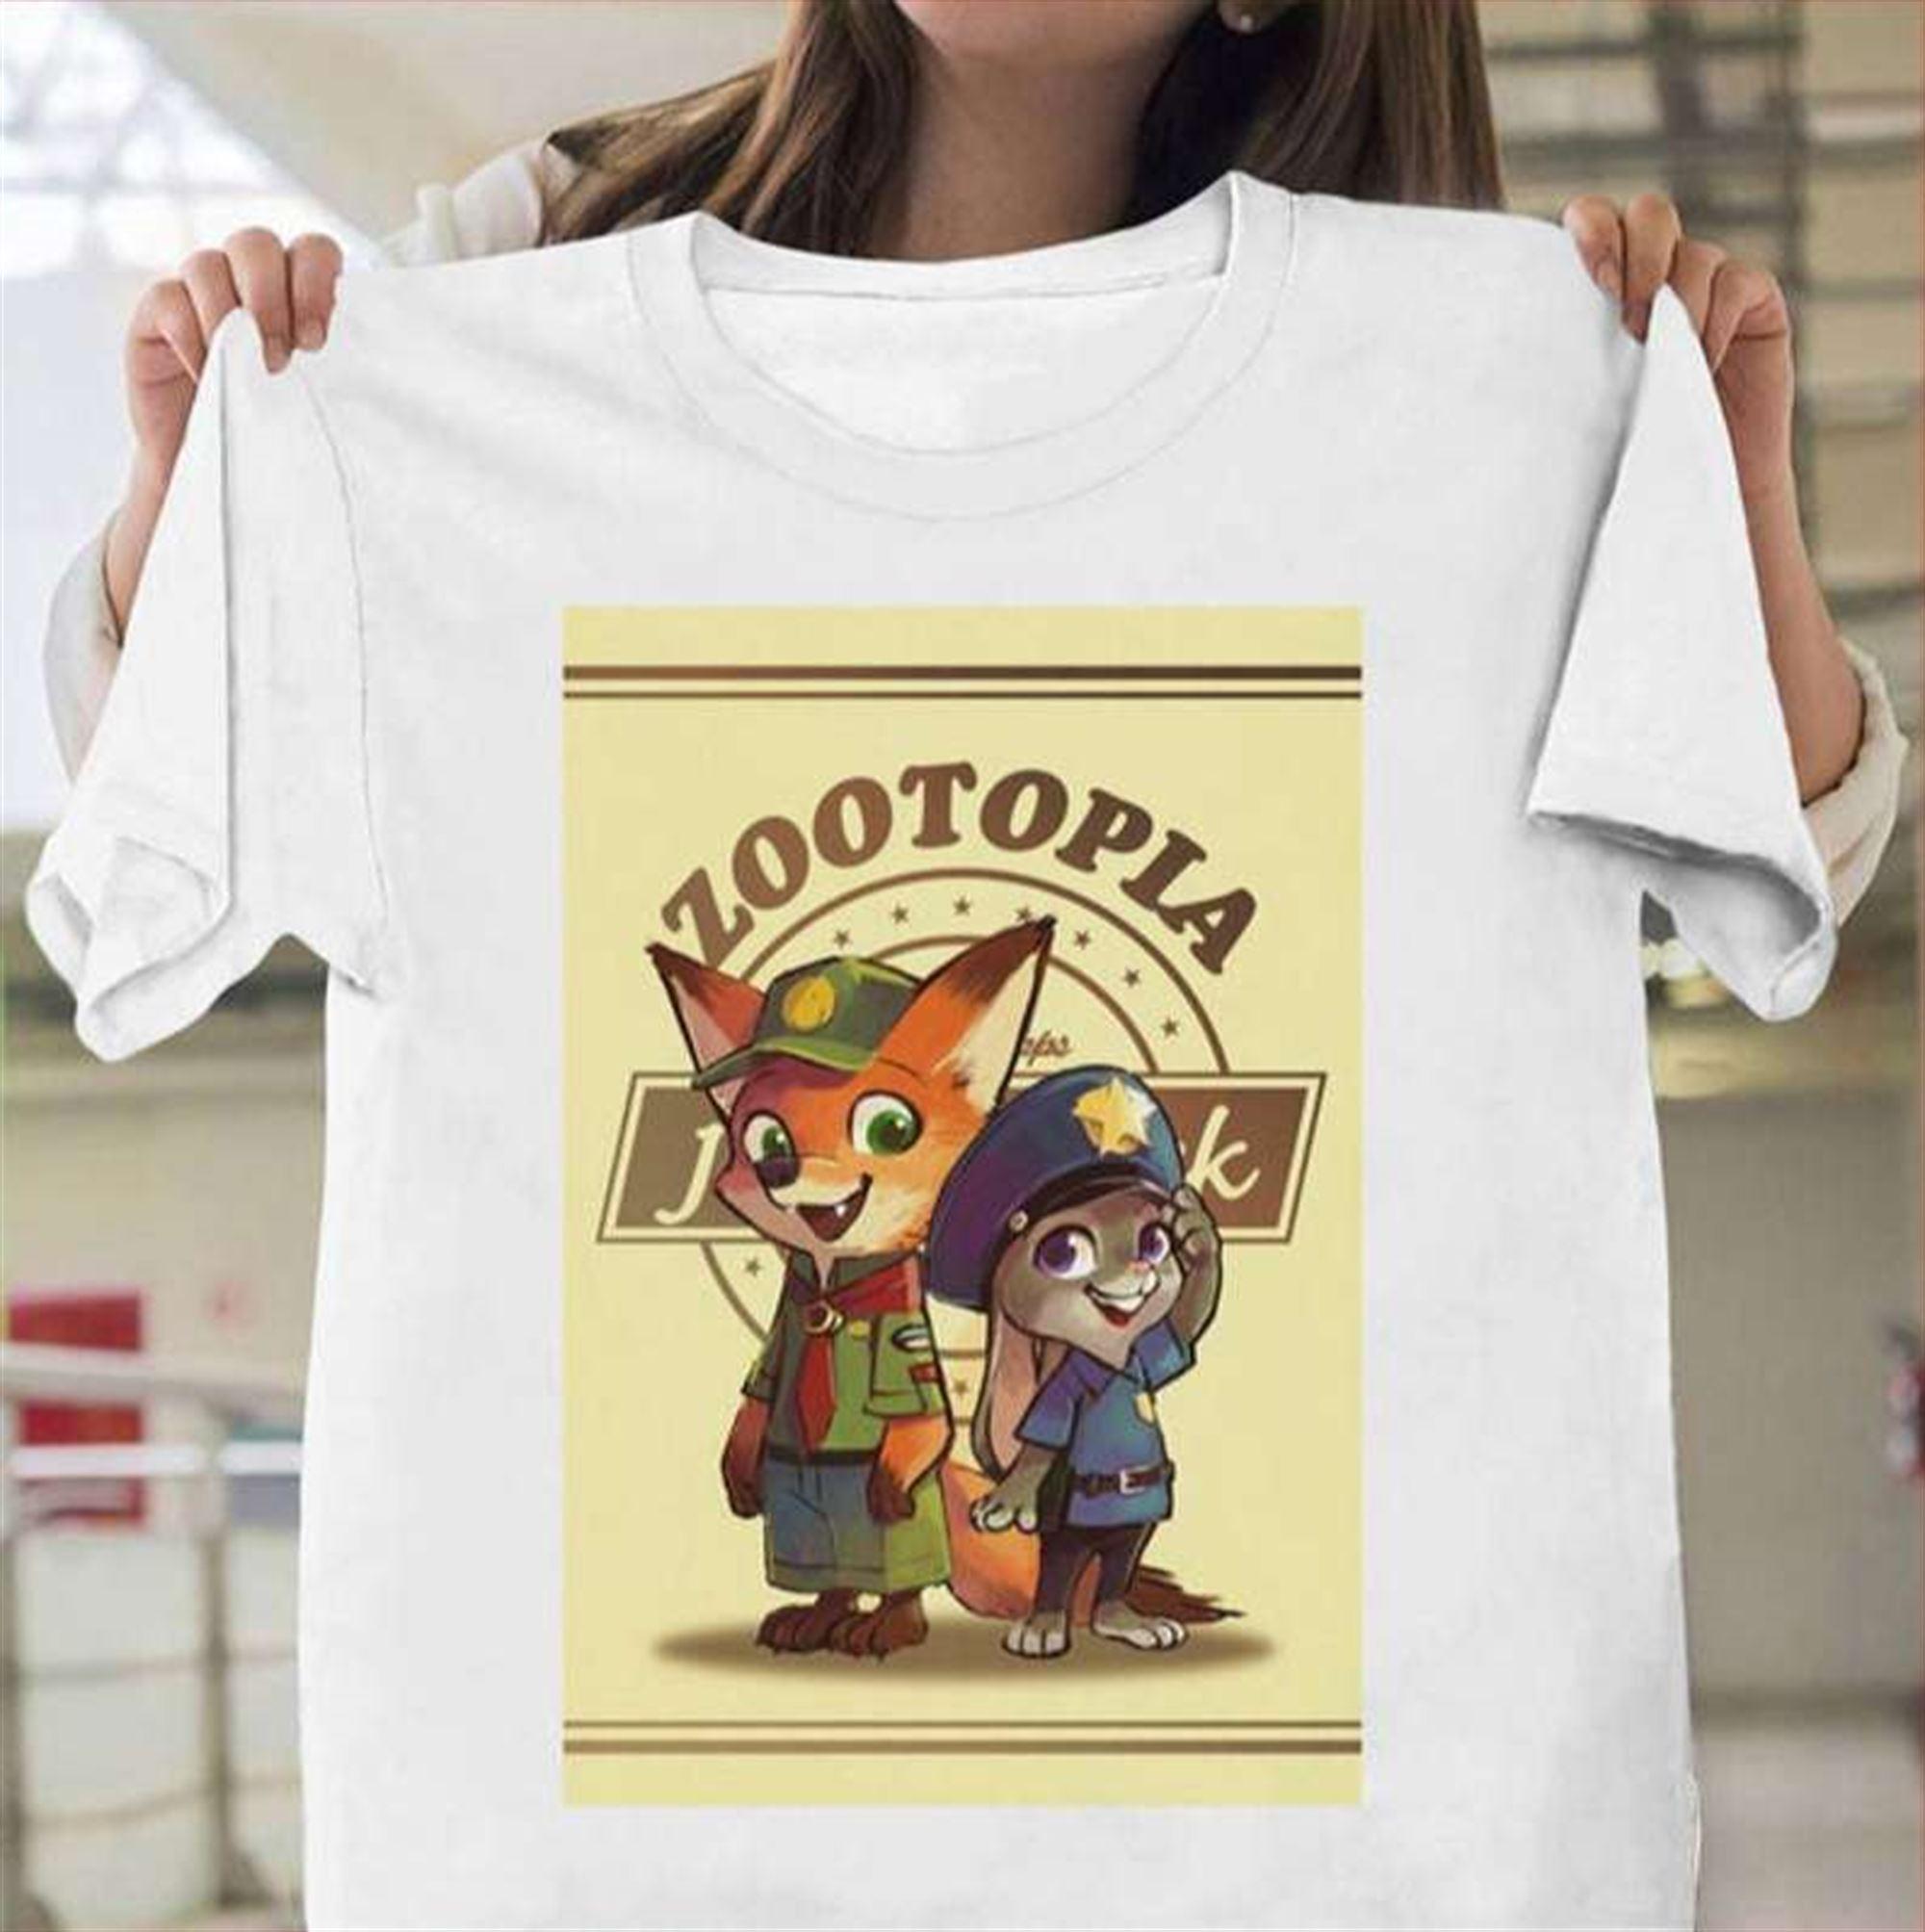 Zootopia Classic Unisex T Shirt Plus Size Up To 5x